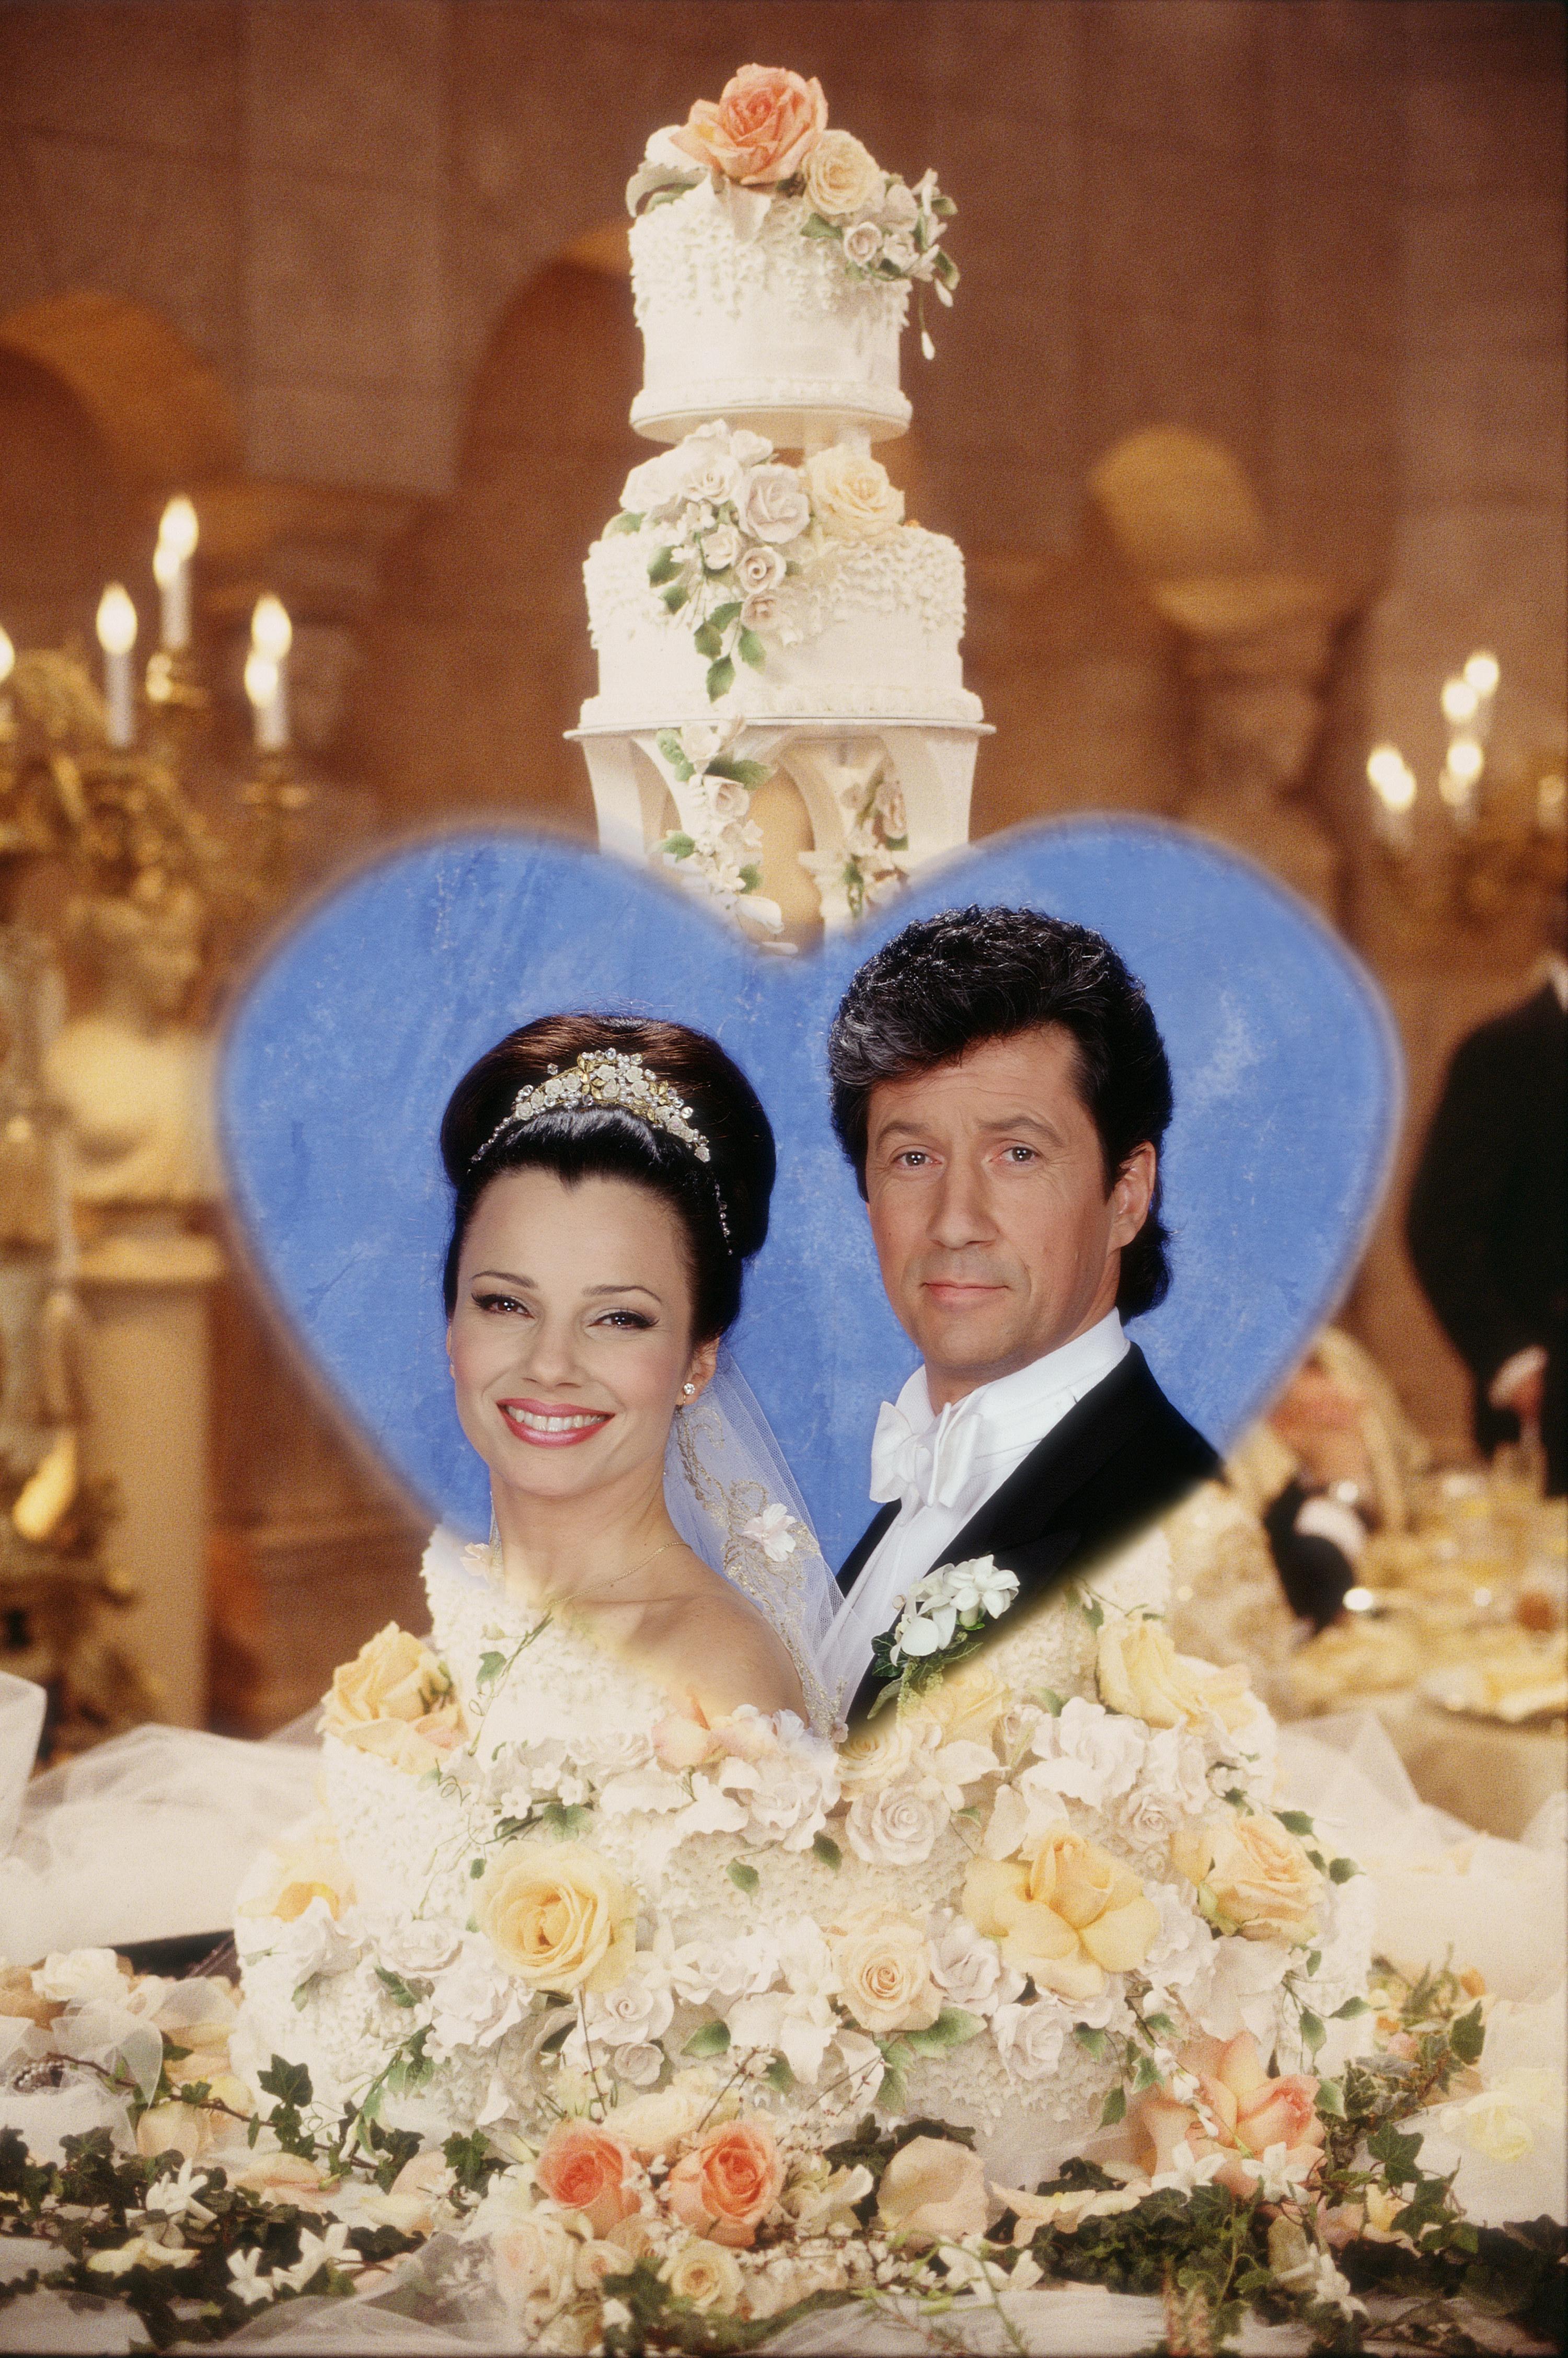 The Nanny wedding cake